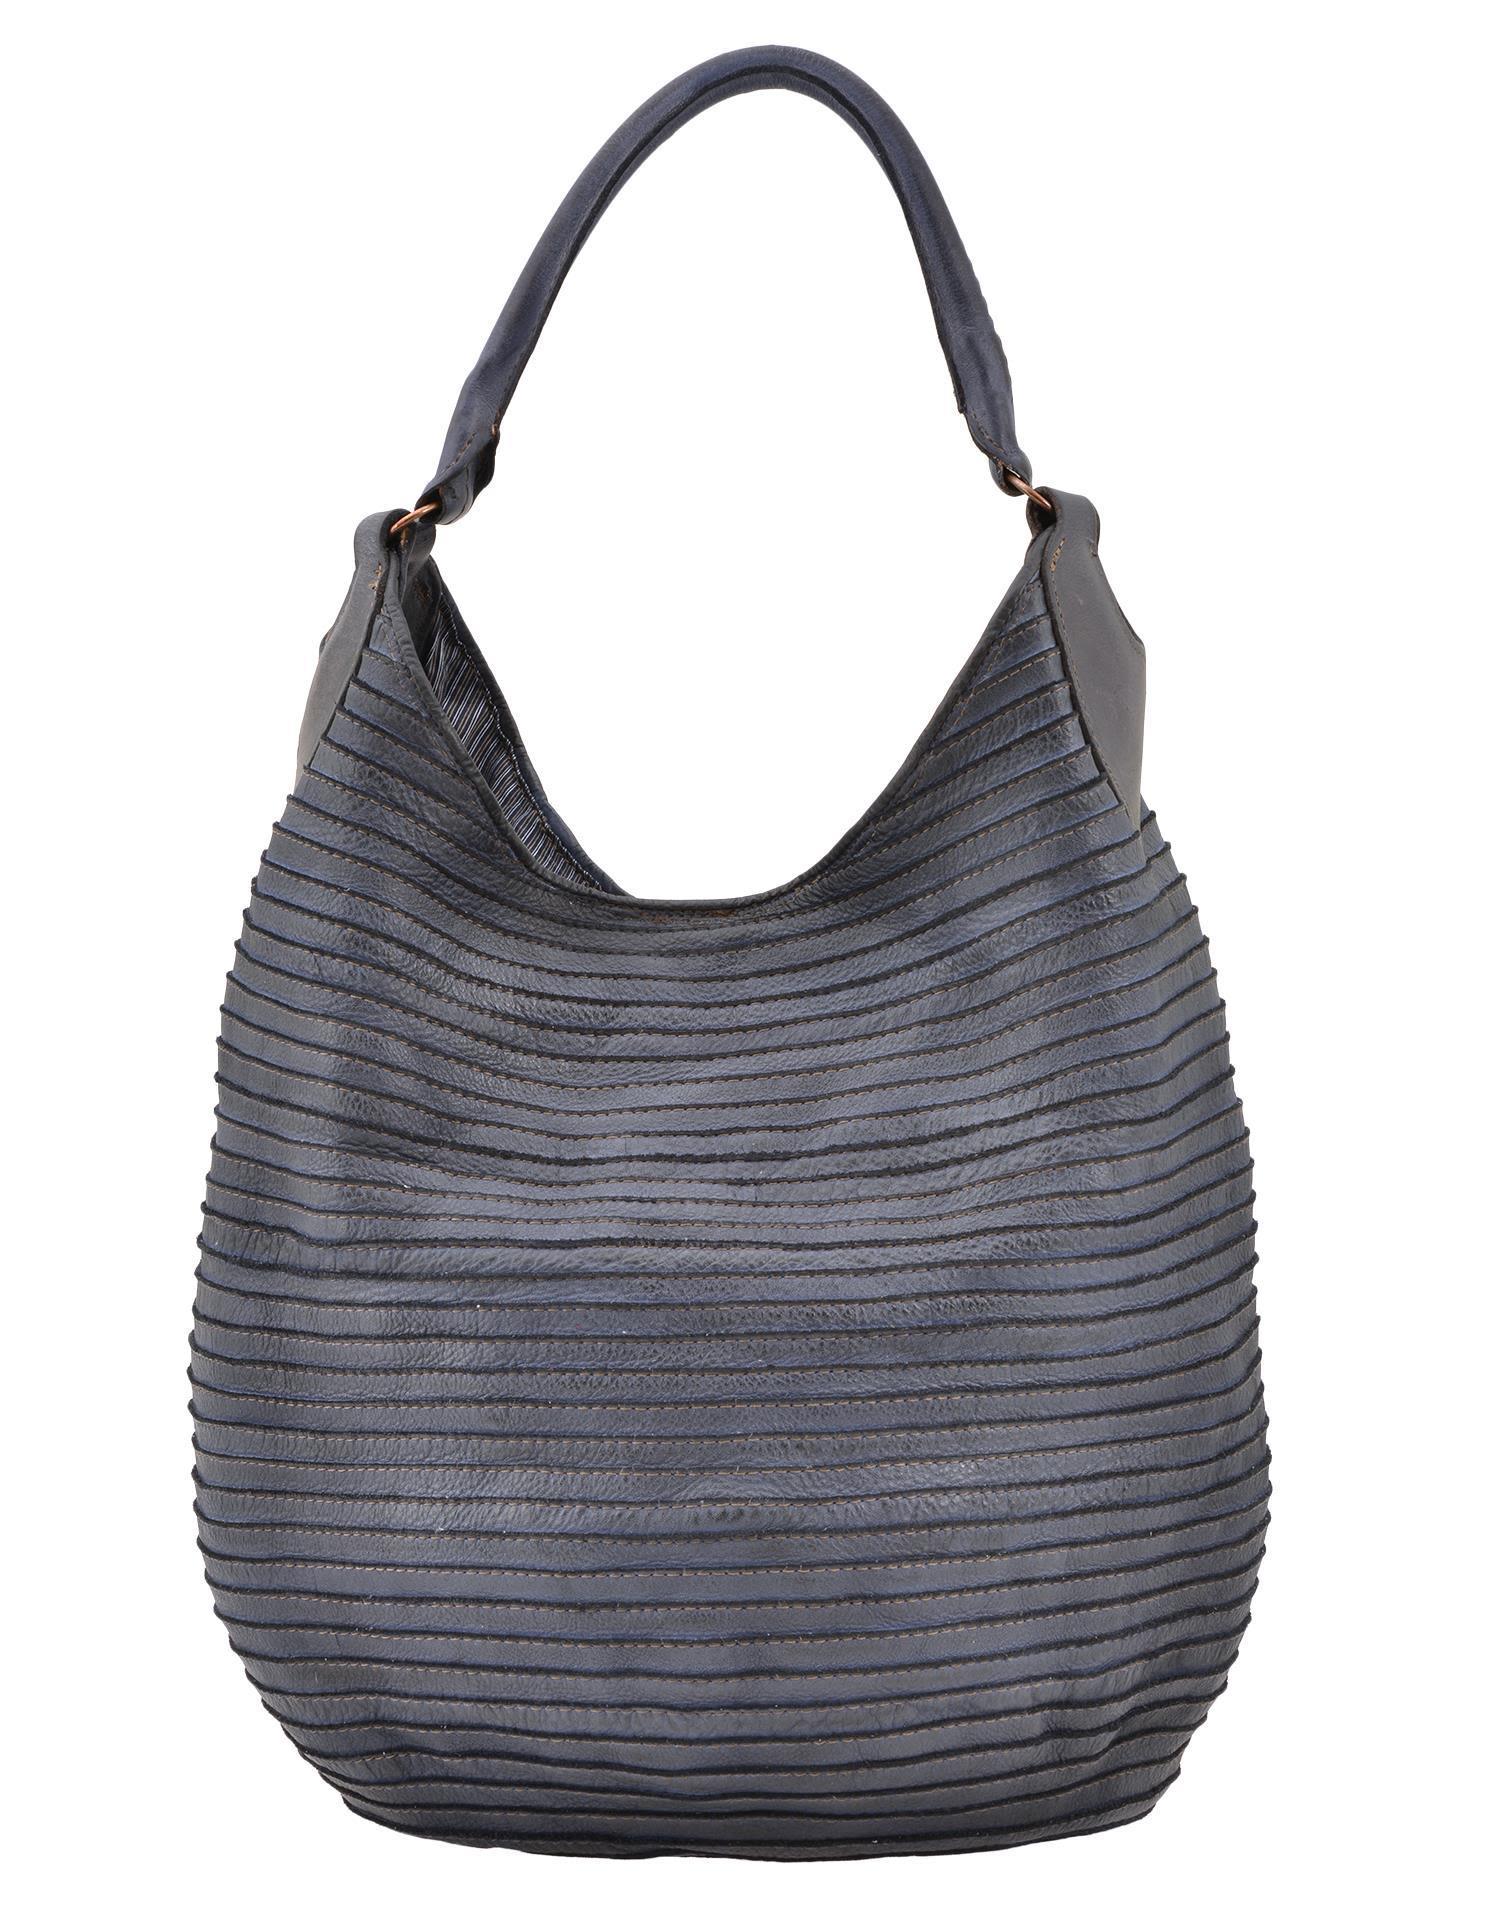 Majo Leather Shoulder Bag In Indaco